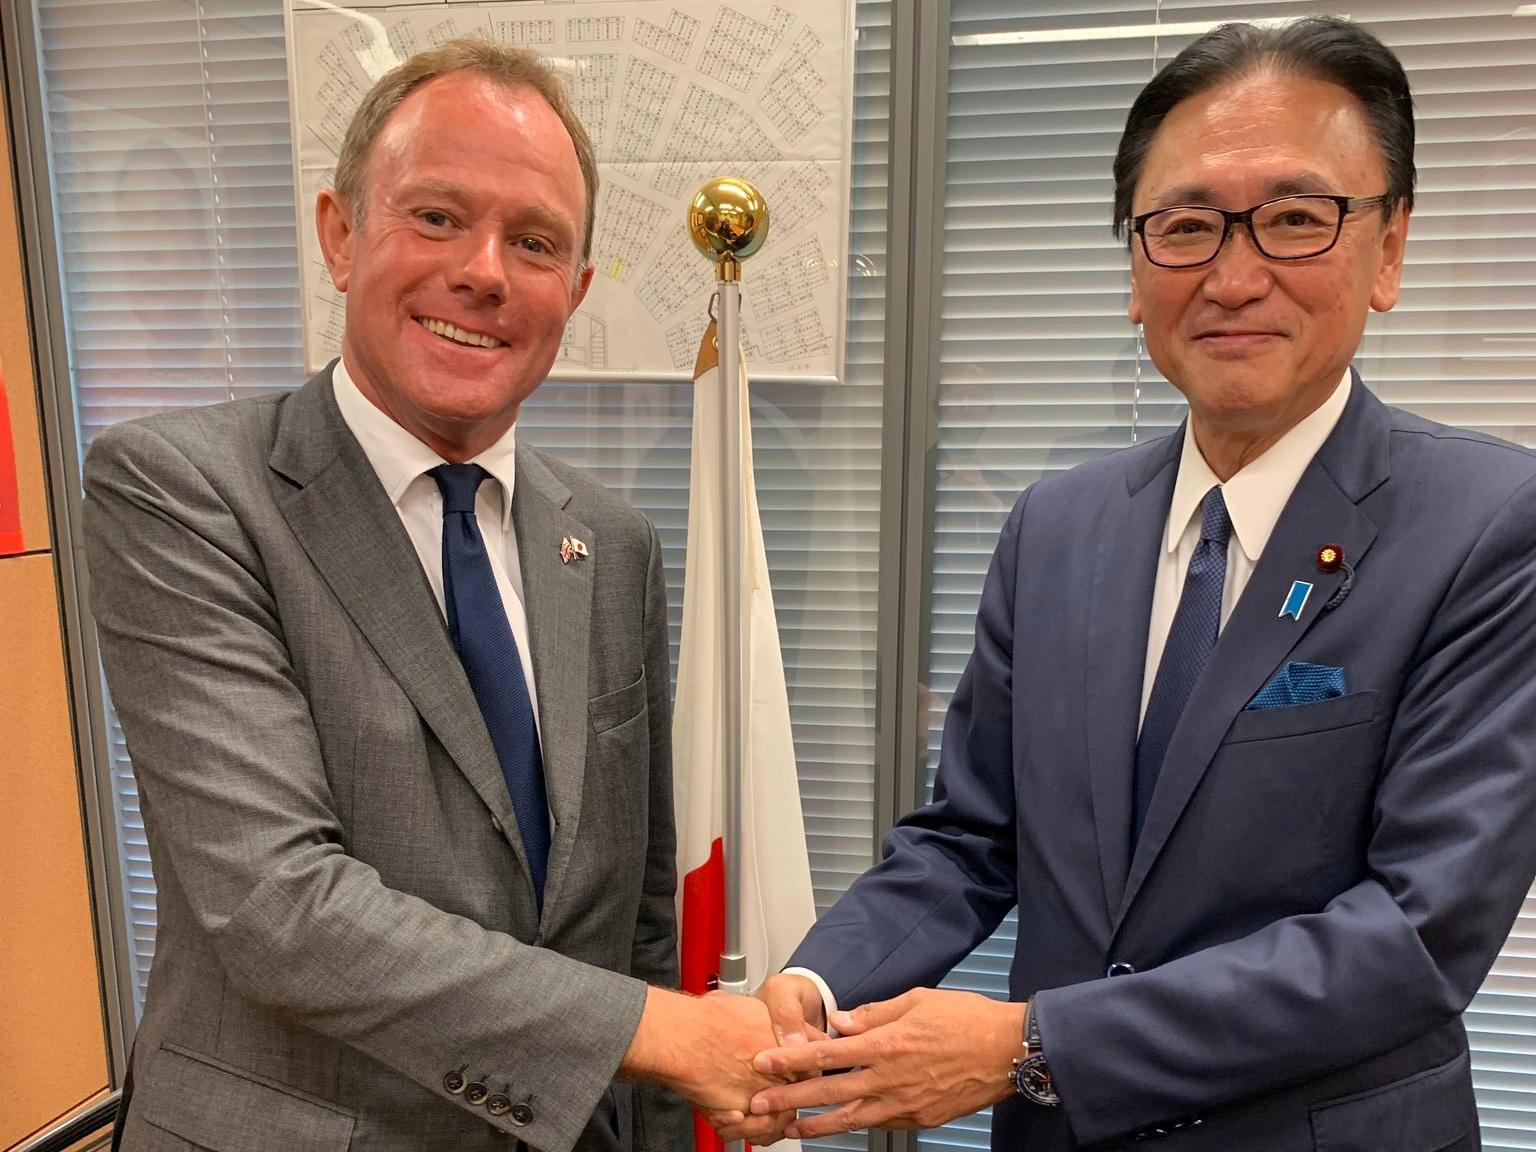 Nick Herbert MP with Representative Keiji Furuya, Chair of the LDP's LGBT Committee, at the Japanese Diet.